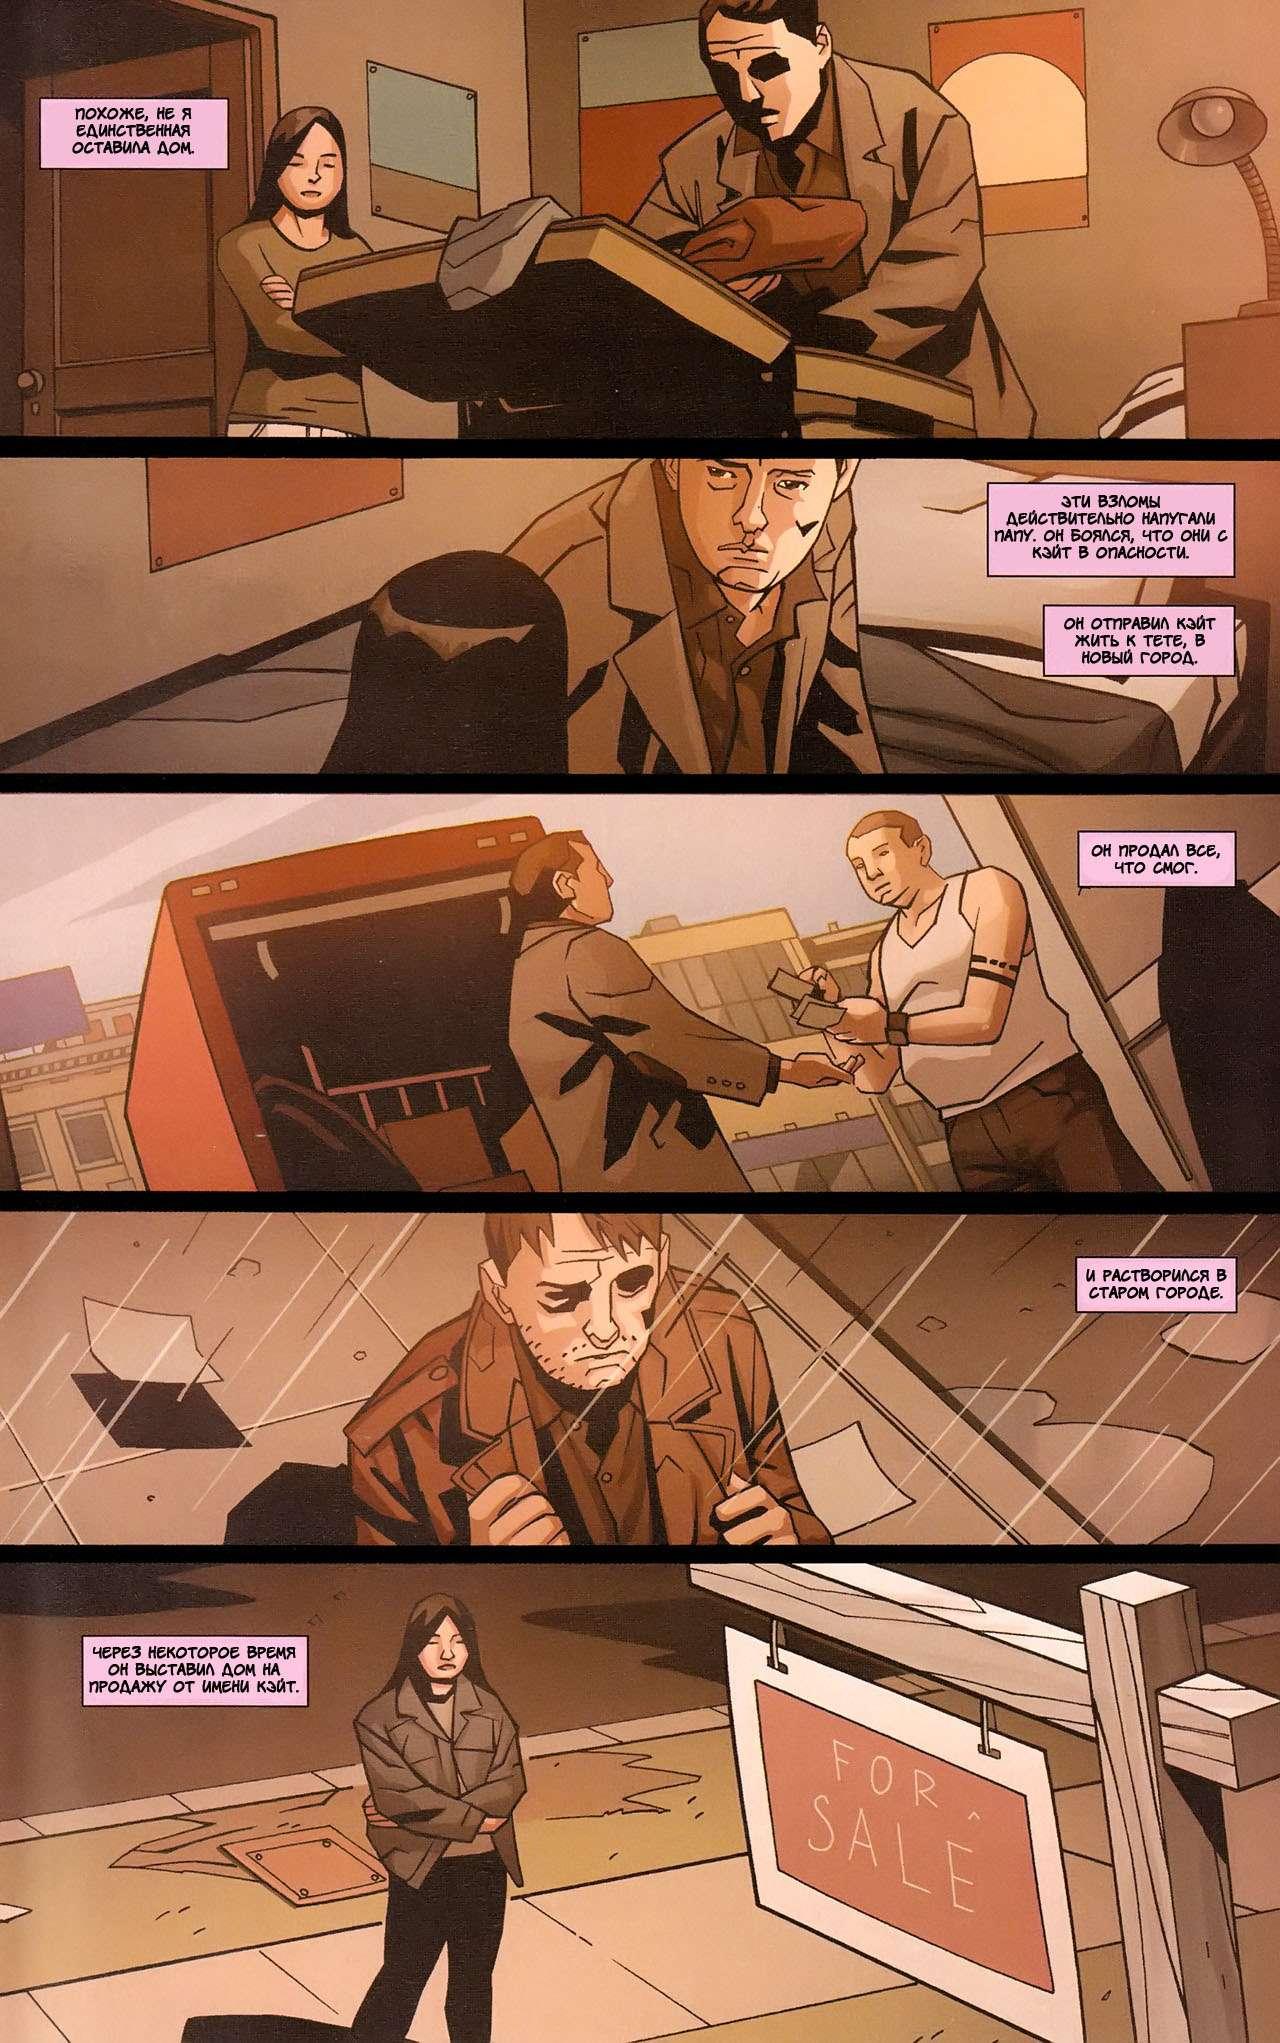 mirrors-edge-05-pg-17